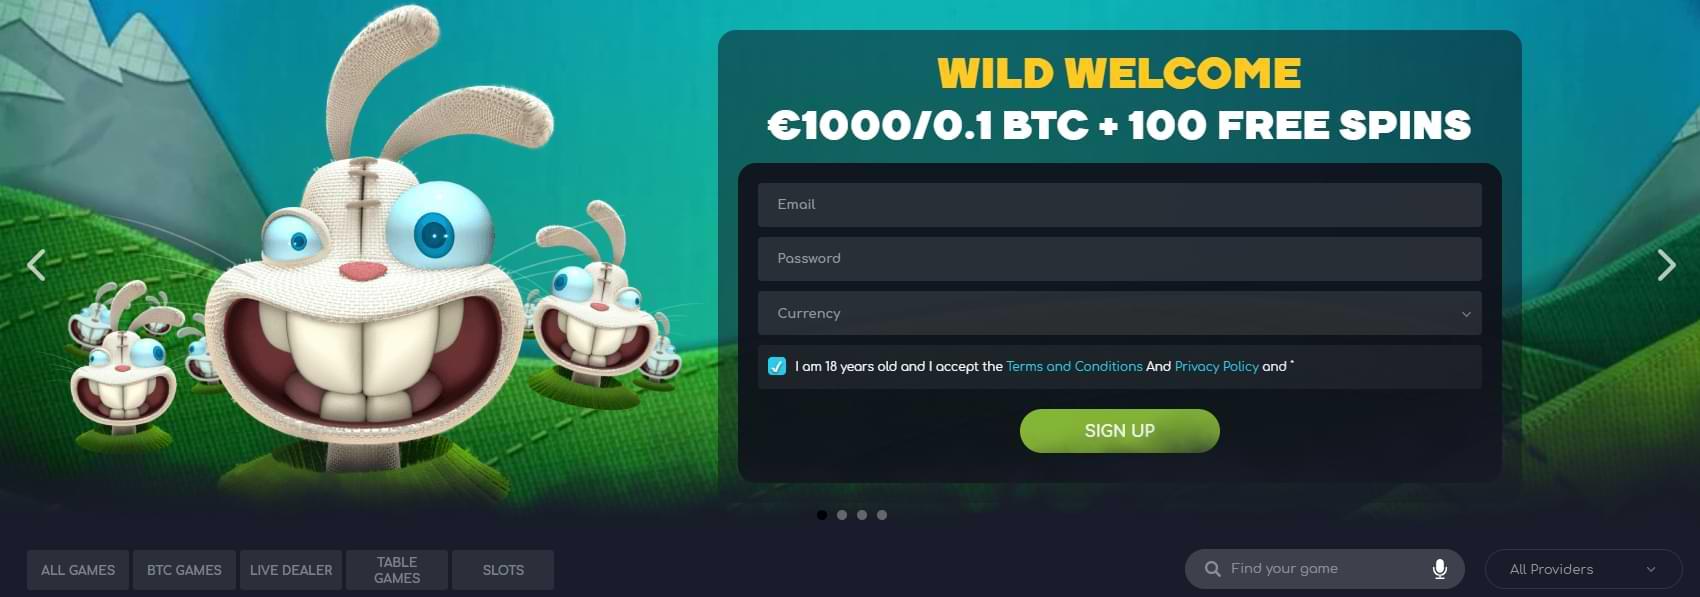 wildtornado welcome offer